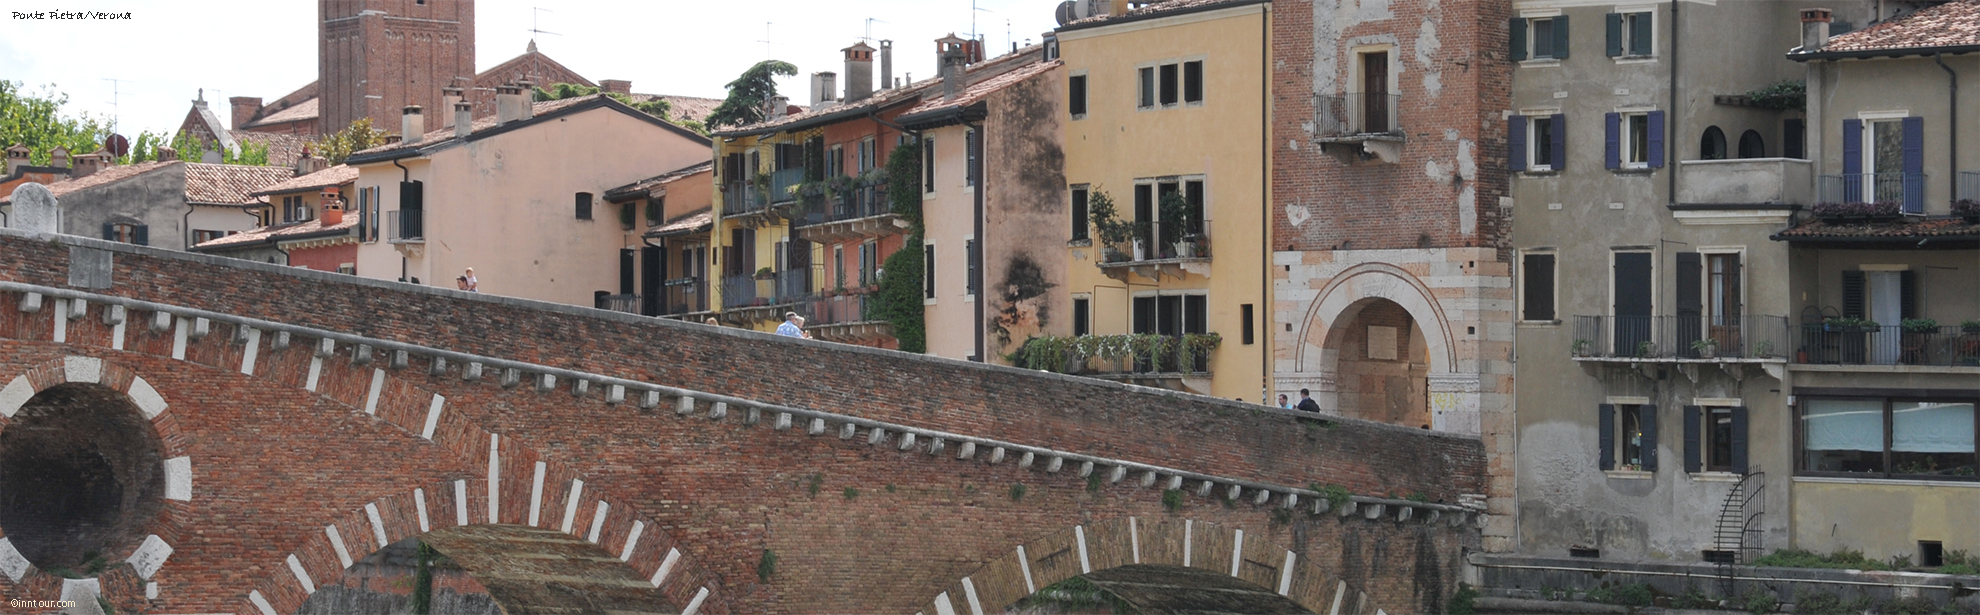 Osportinntour_Ponte-Pietra_Verona_DSC_1020